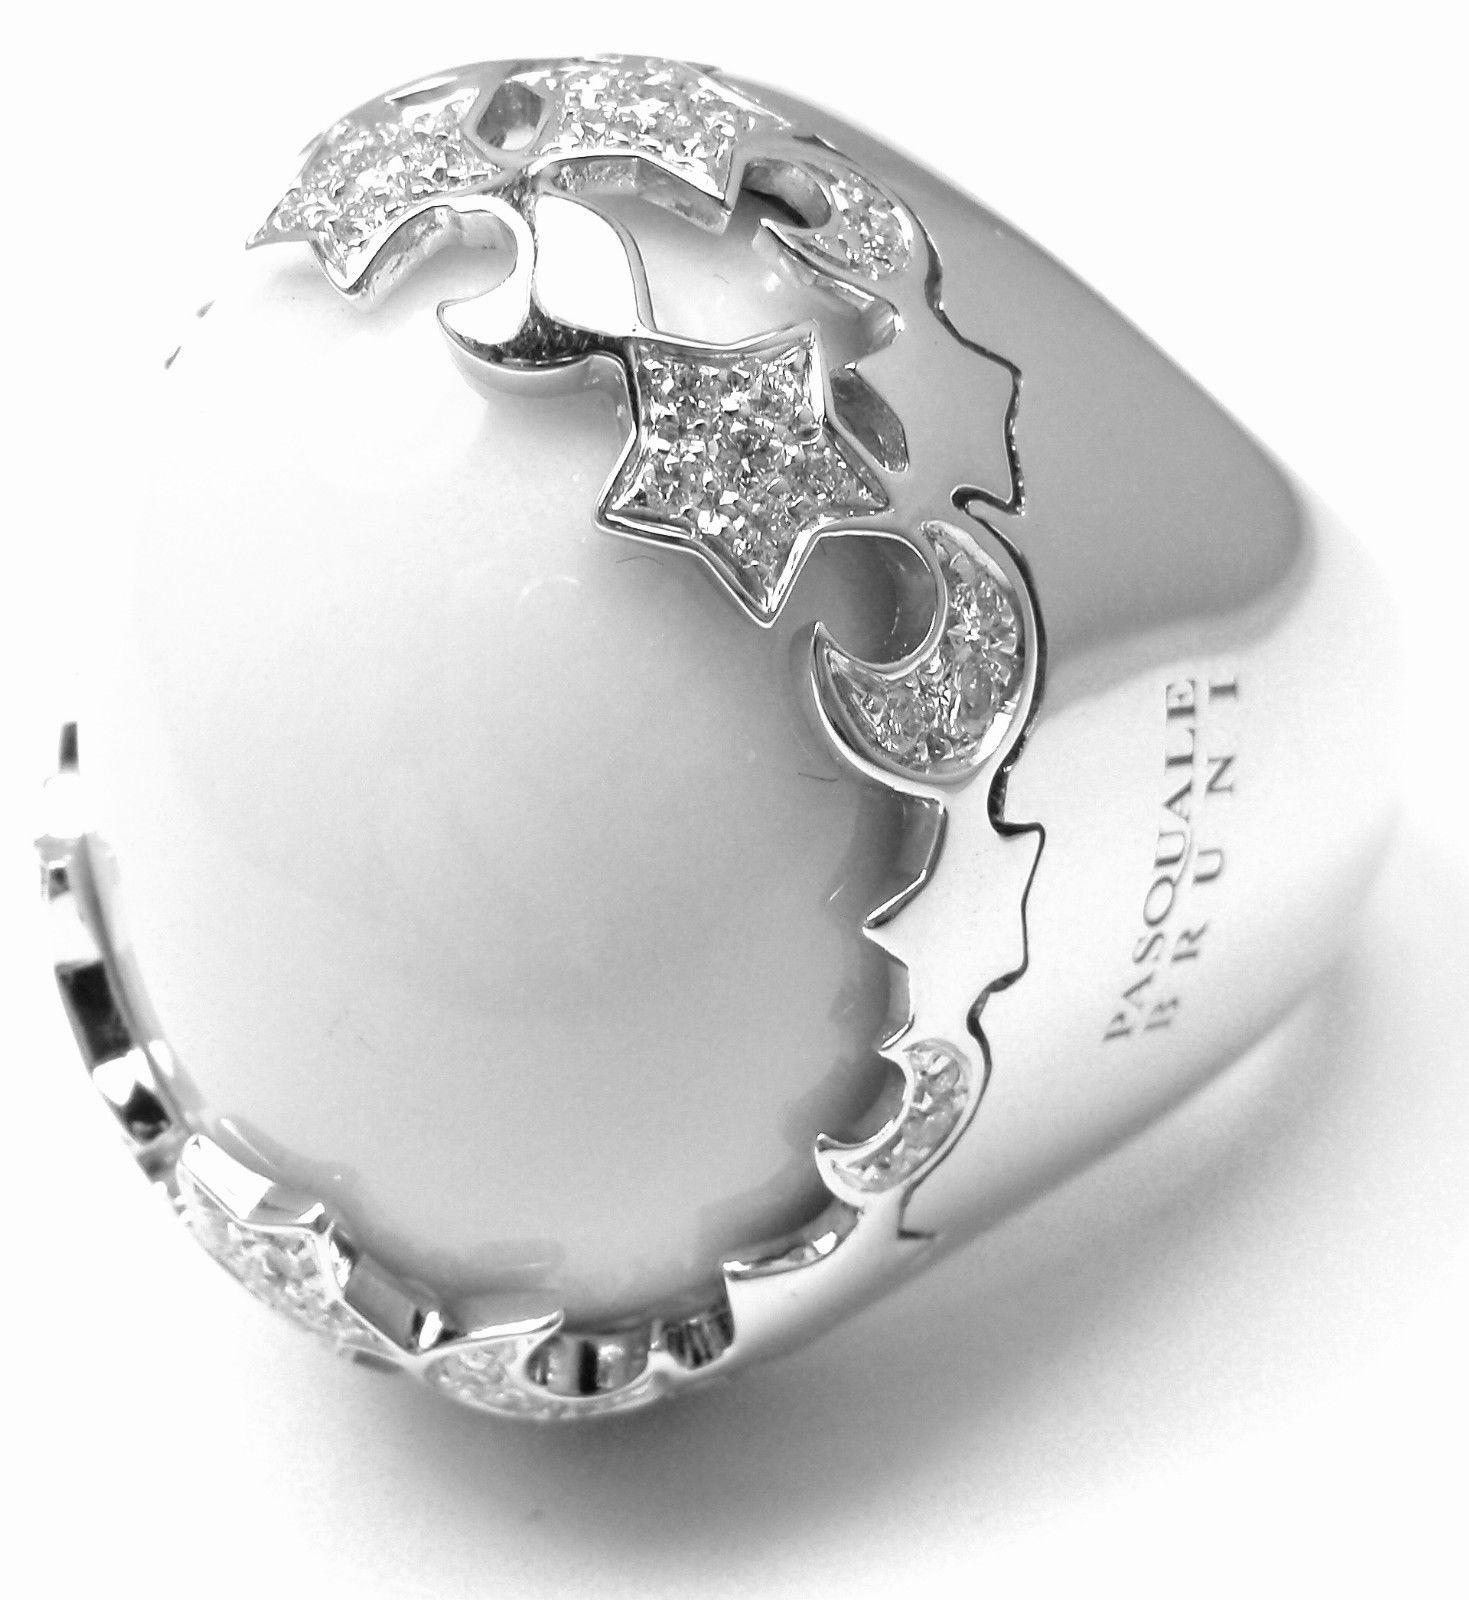 """""Pasquale Bruni 18K White Gold Diamond Ring"""""" 295401"